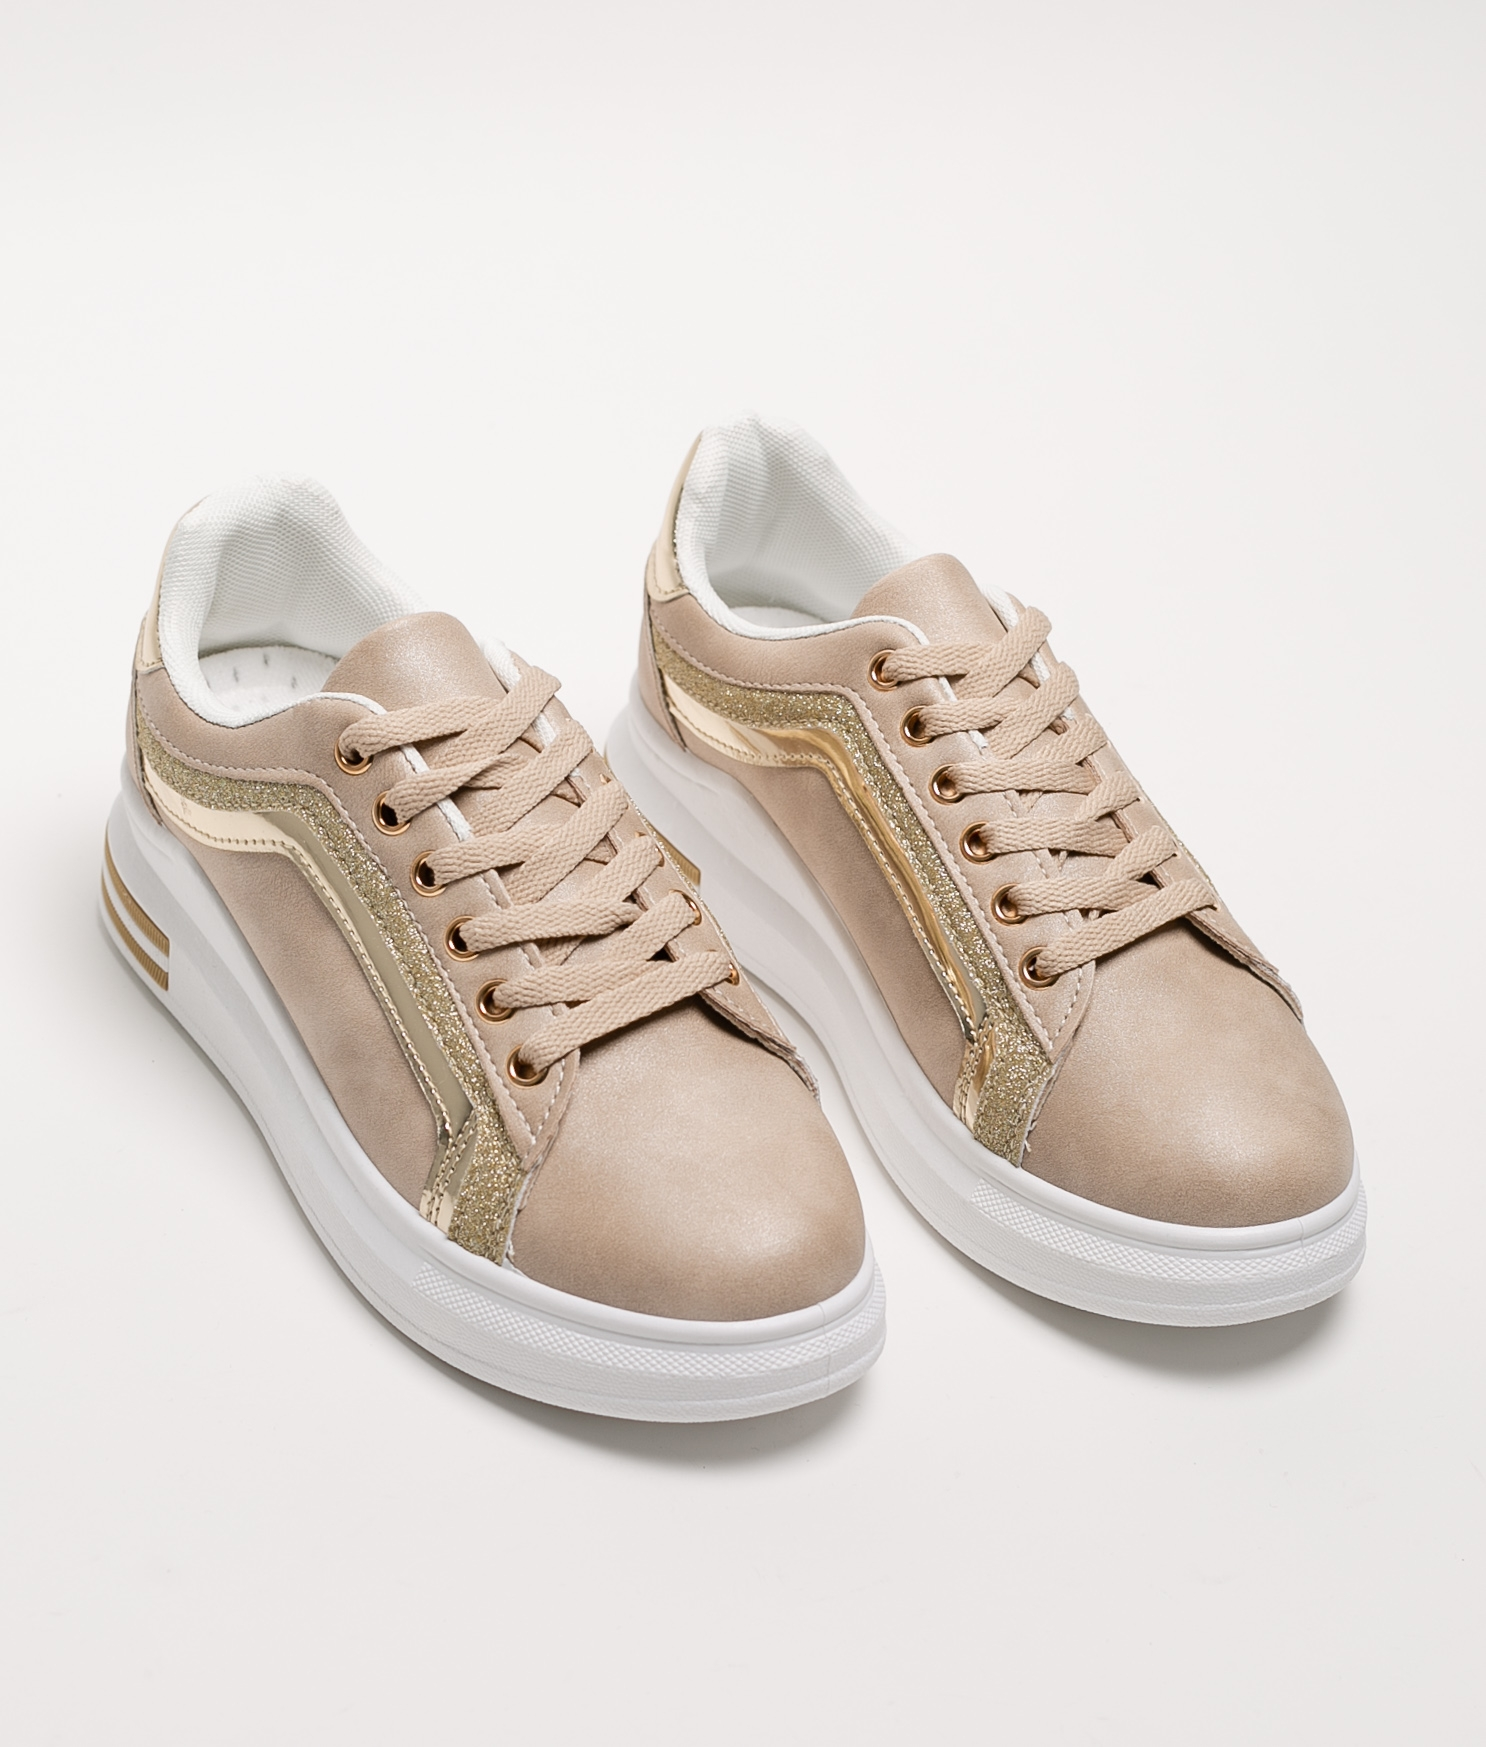 Sneakers LUPI - beige